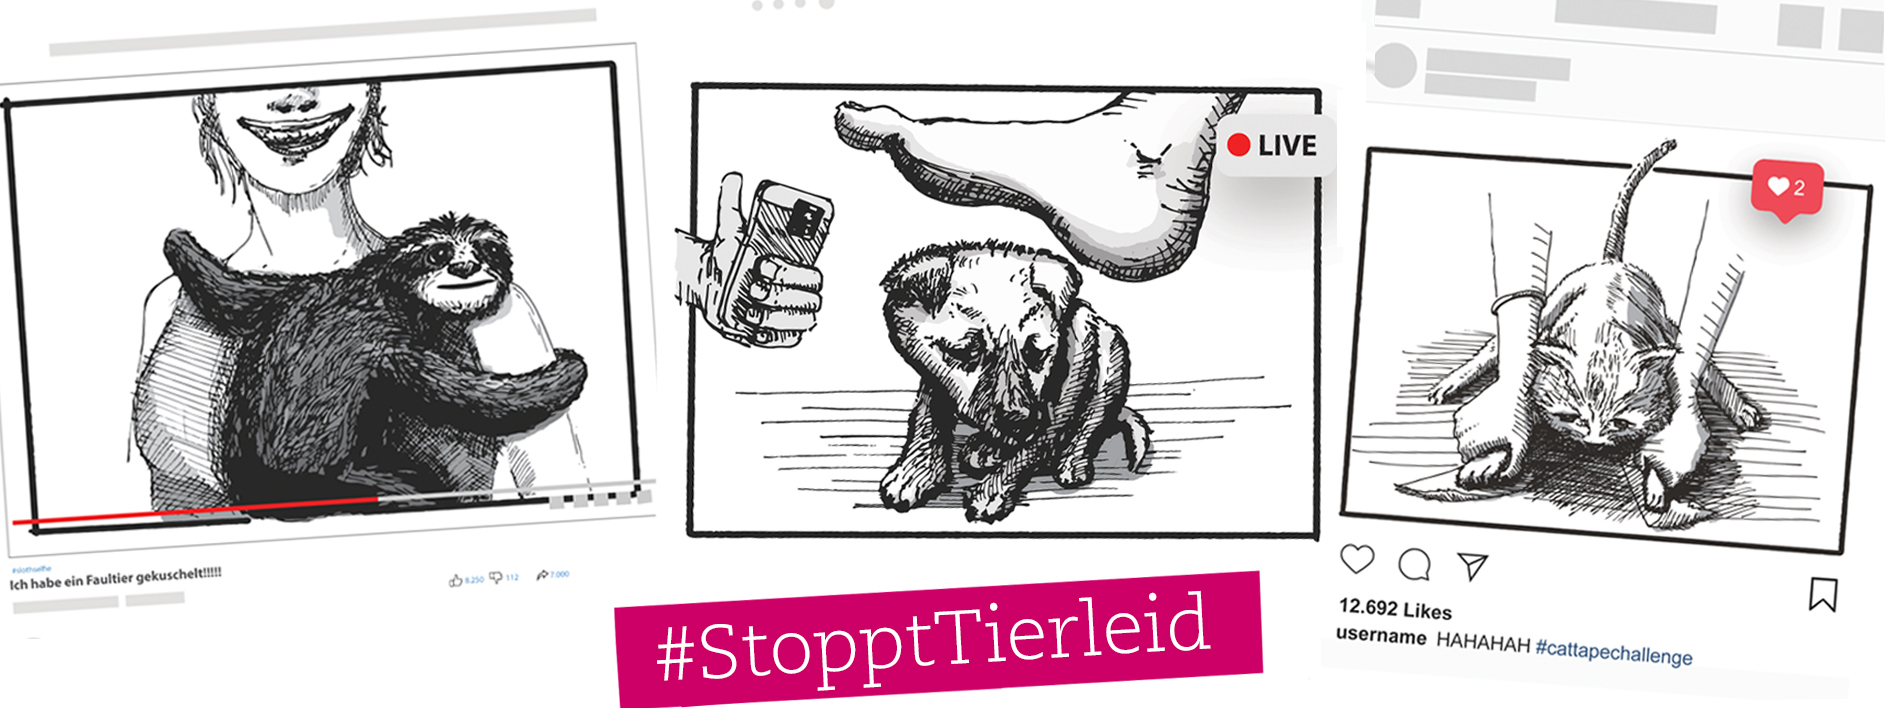 Kampagne: Stoppt Tierleid in den sozialen Netzwerken